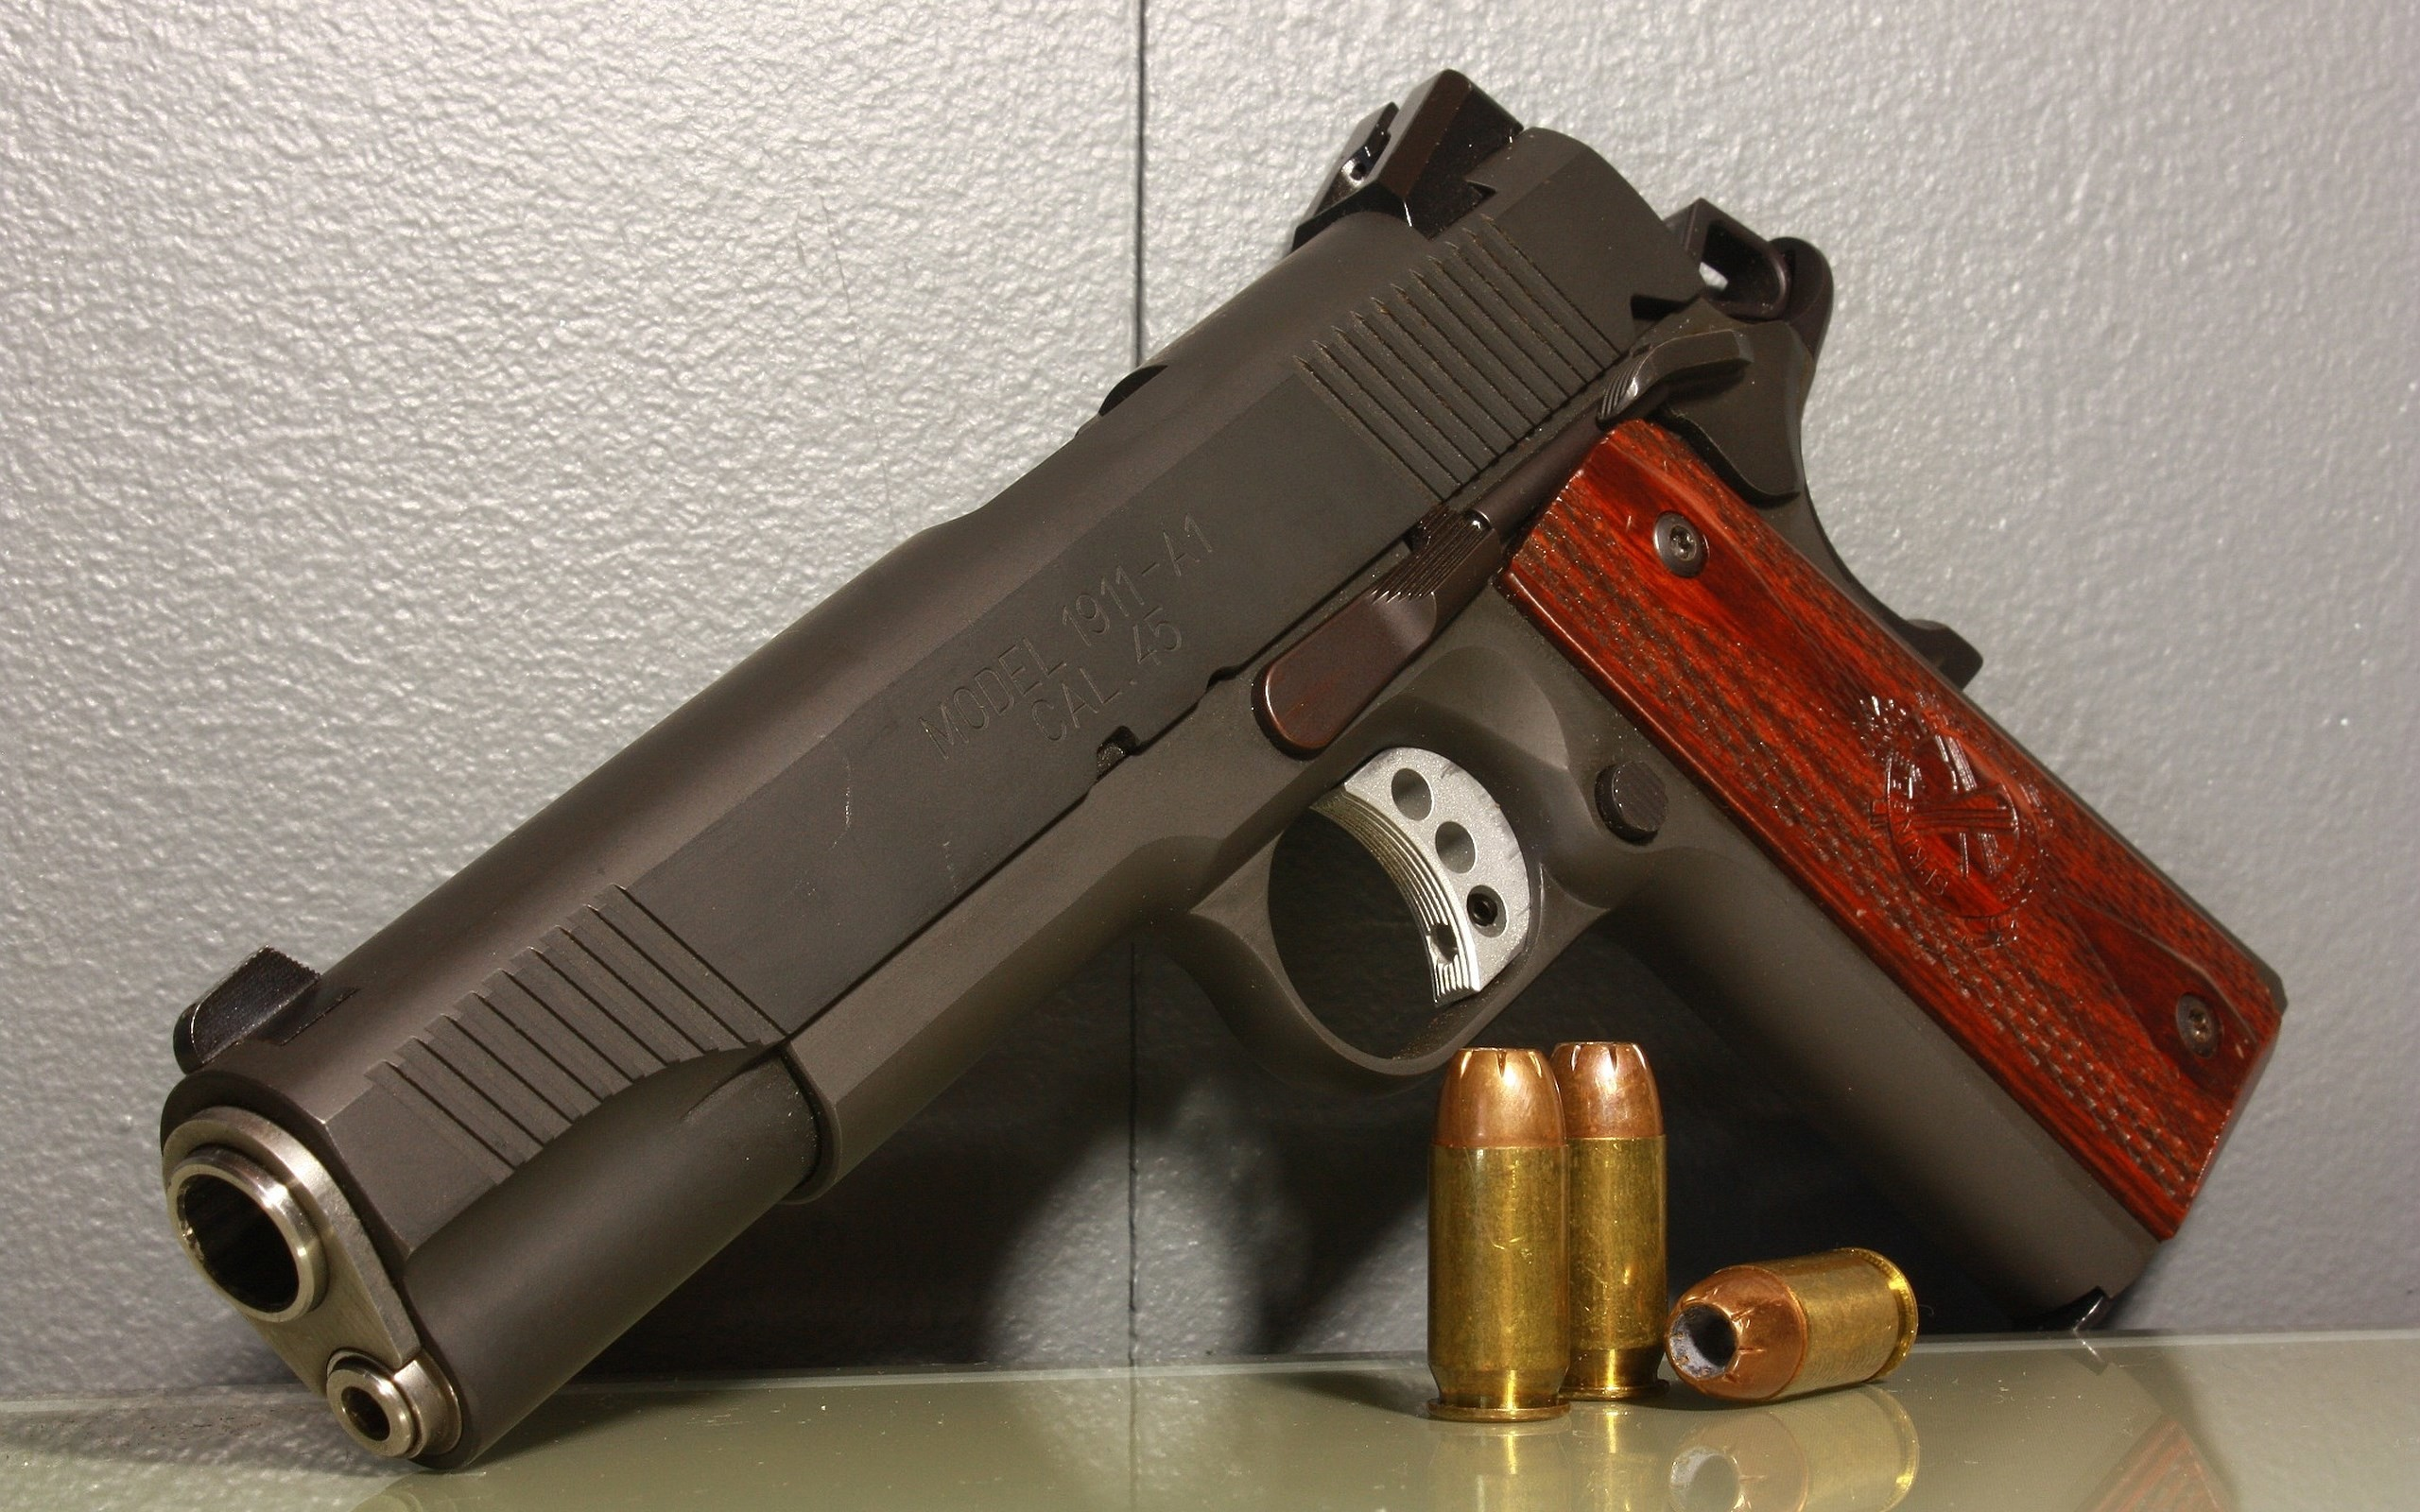 Amazing springfield armory 1911 pistol